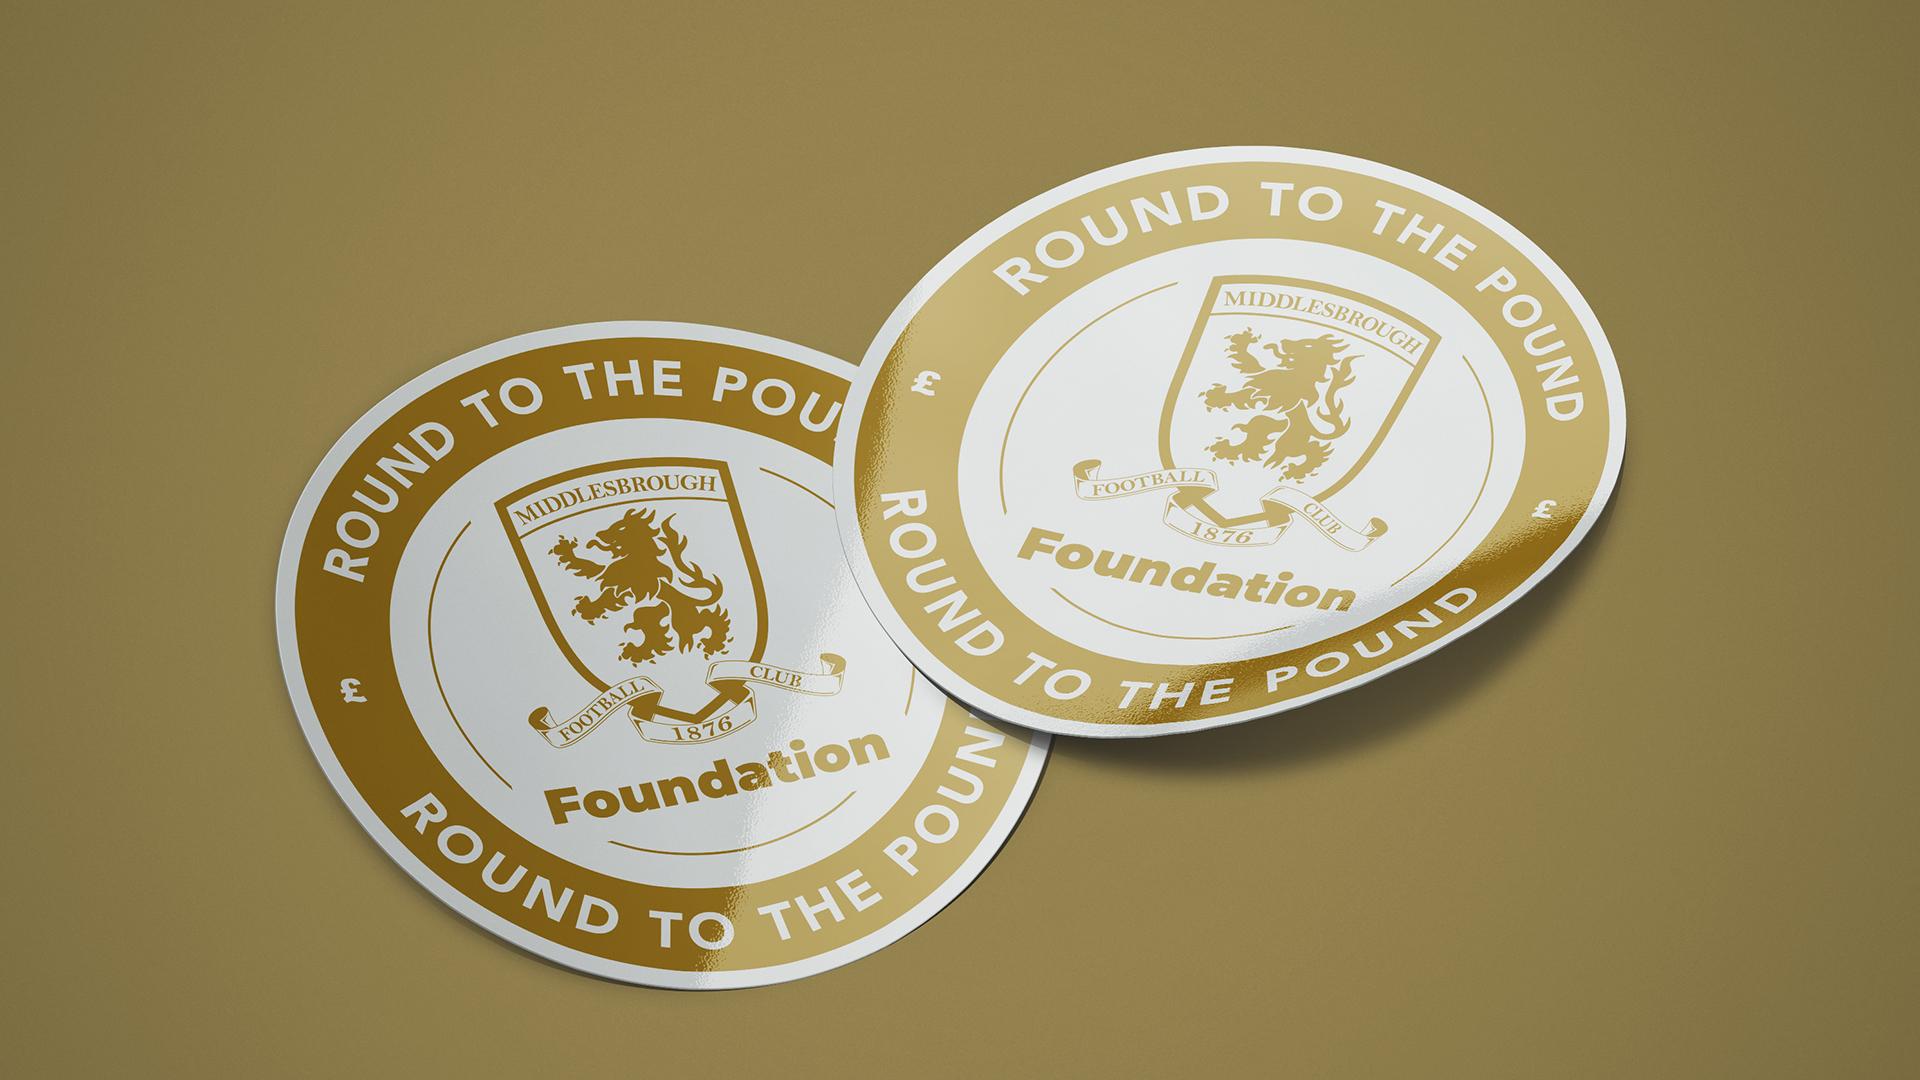 Round to the pound logo design printed stickers for  - Riverside Stadium #boro #uptheboro